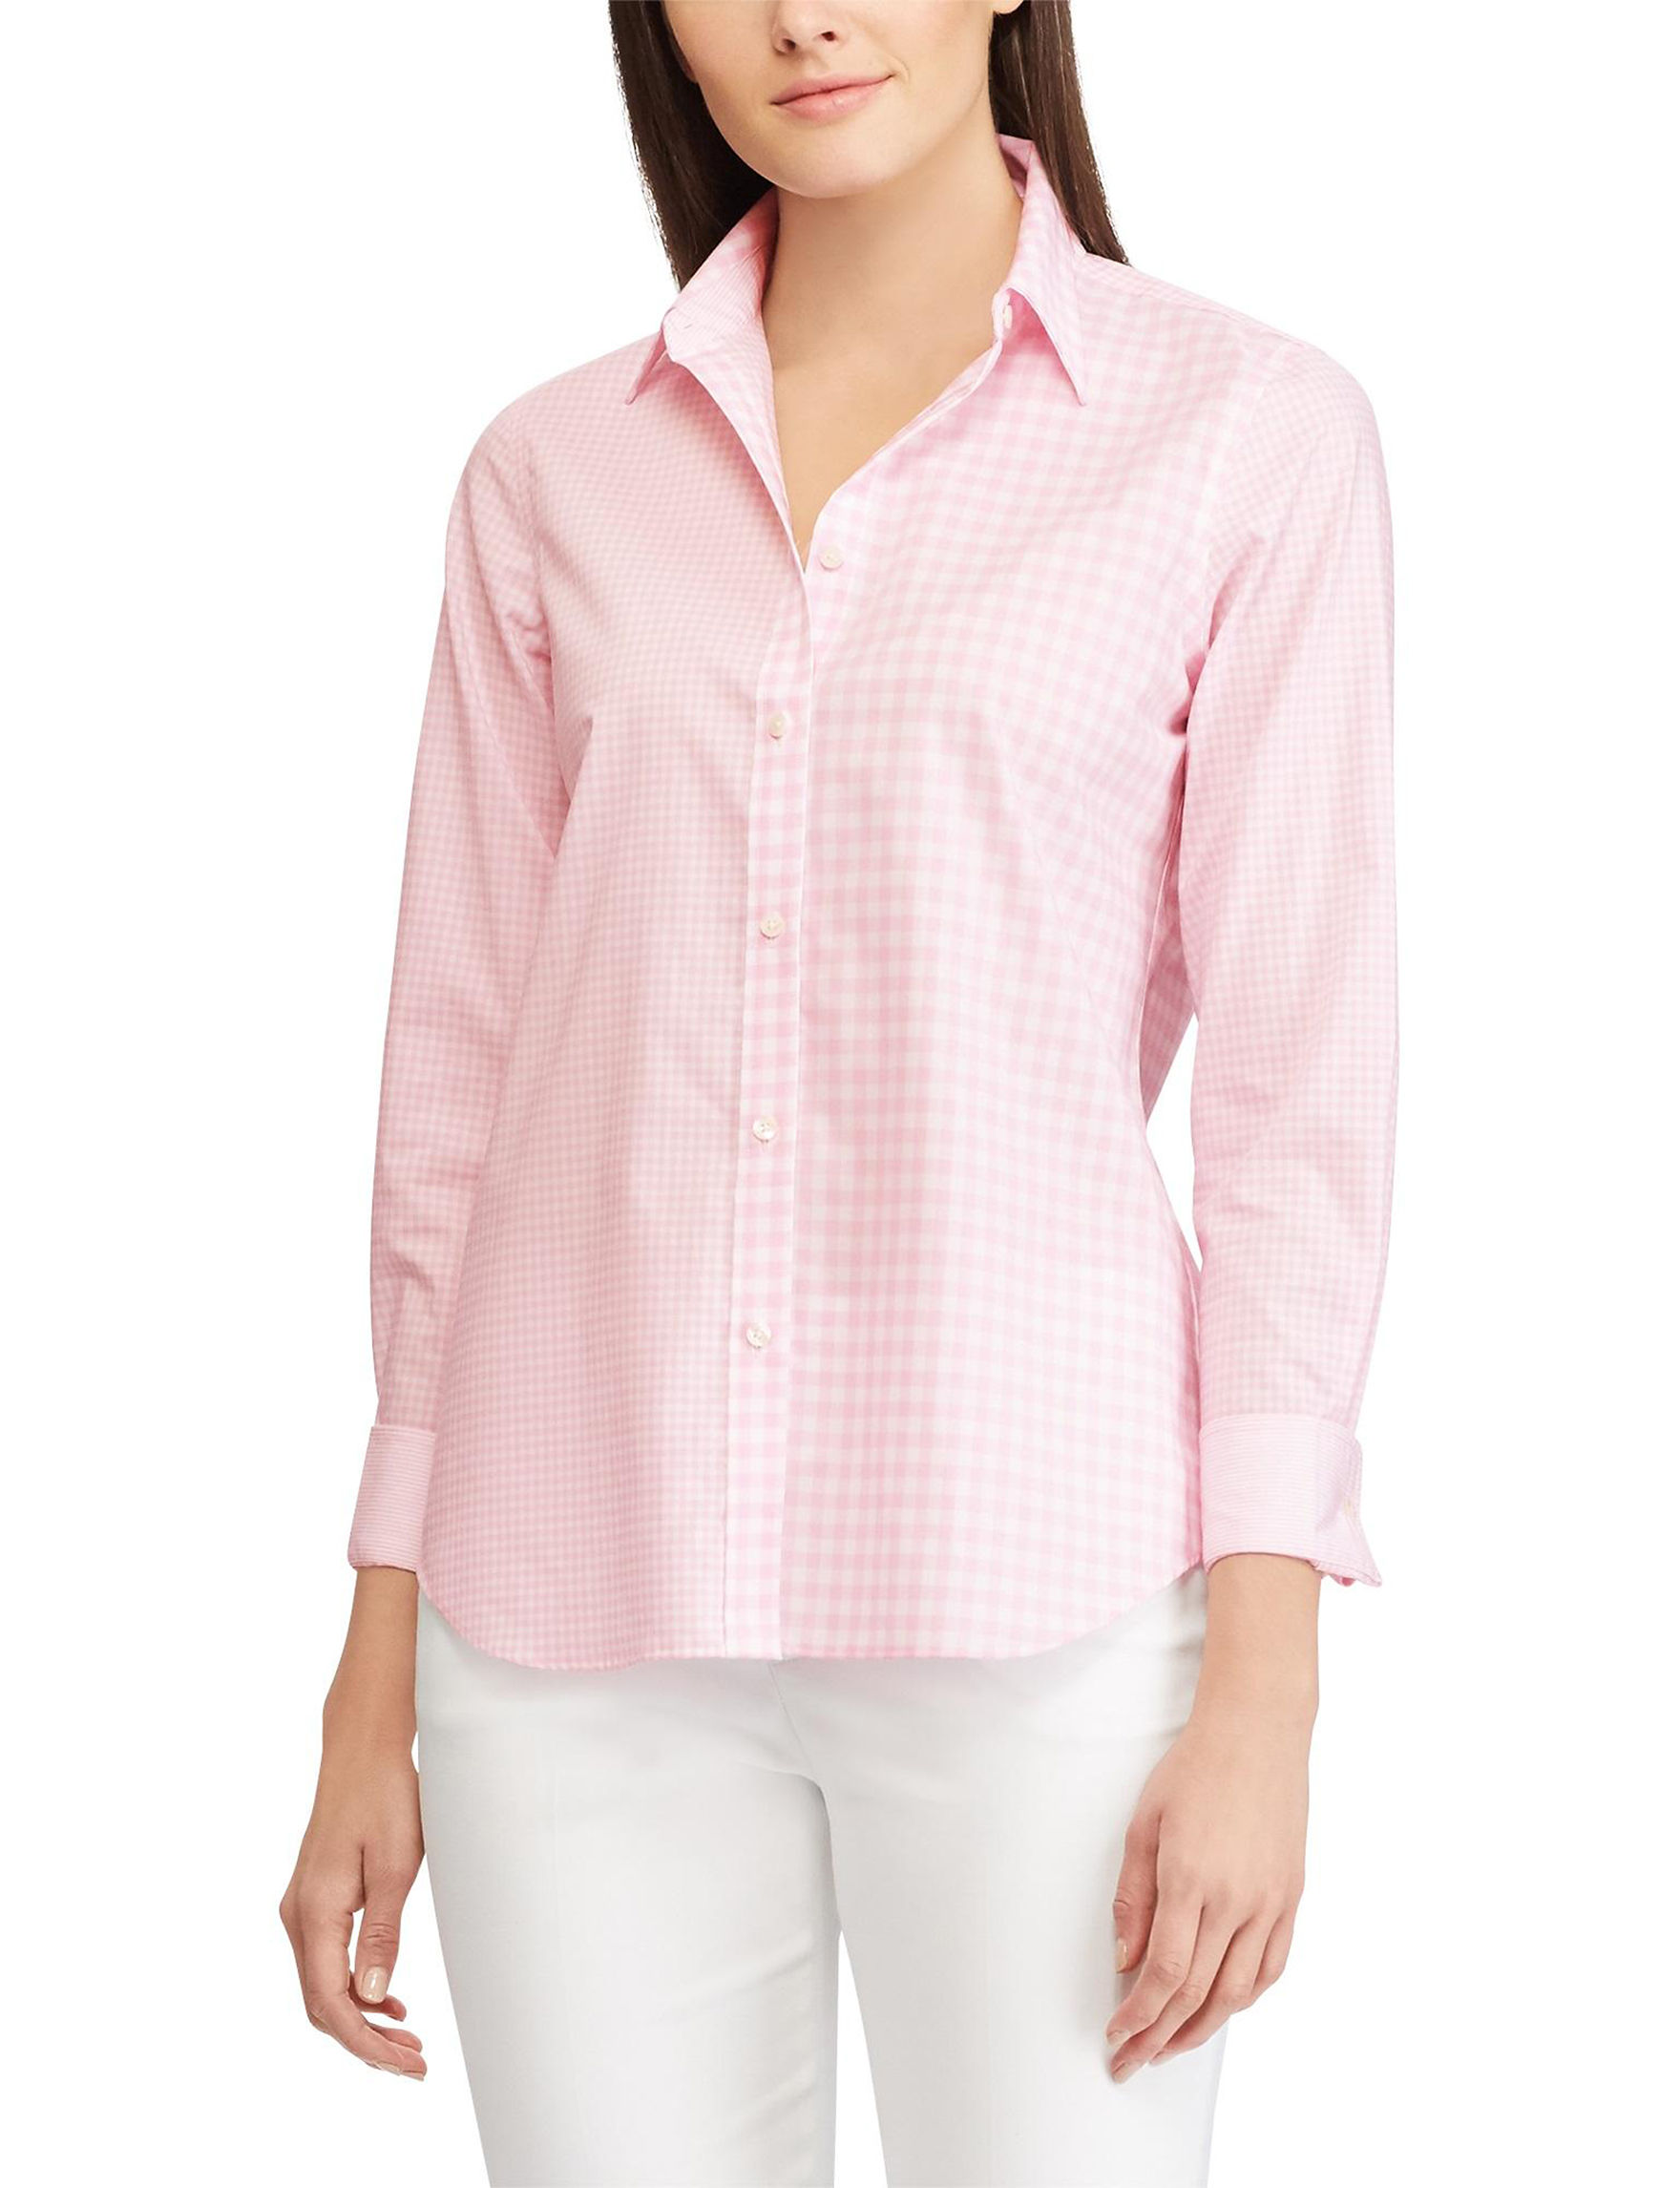 Chaps Pink / White Shirts & Blouses